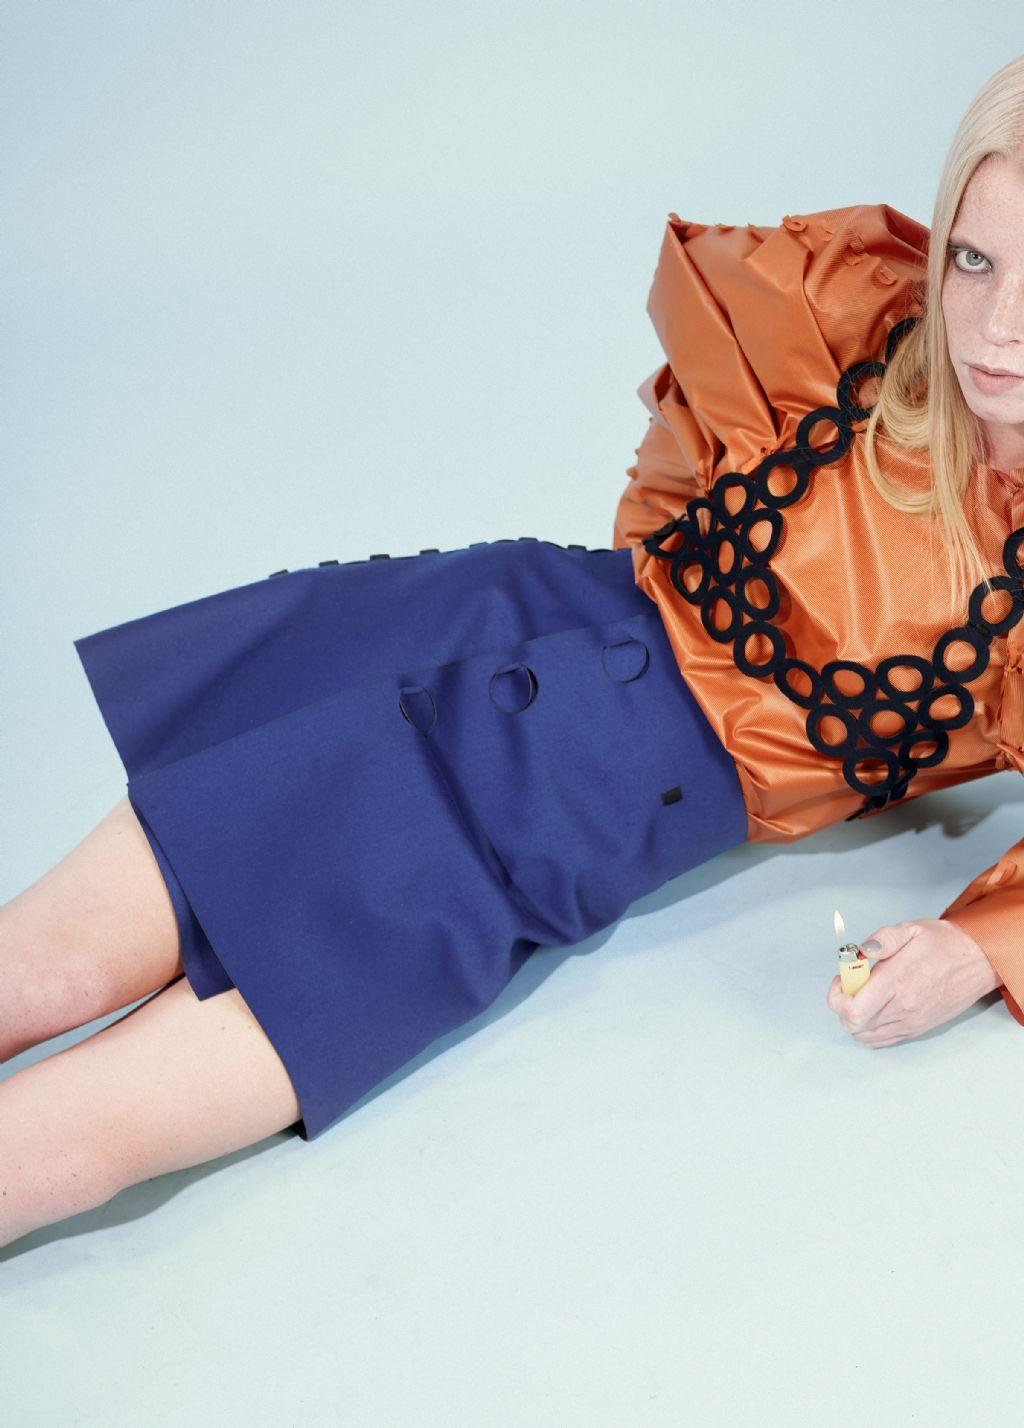 Ecodegin Award: Post Couture Collective